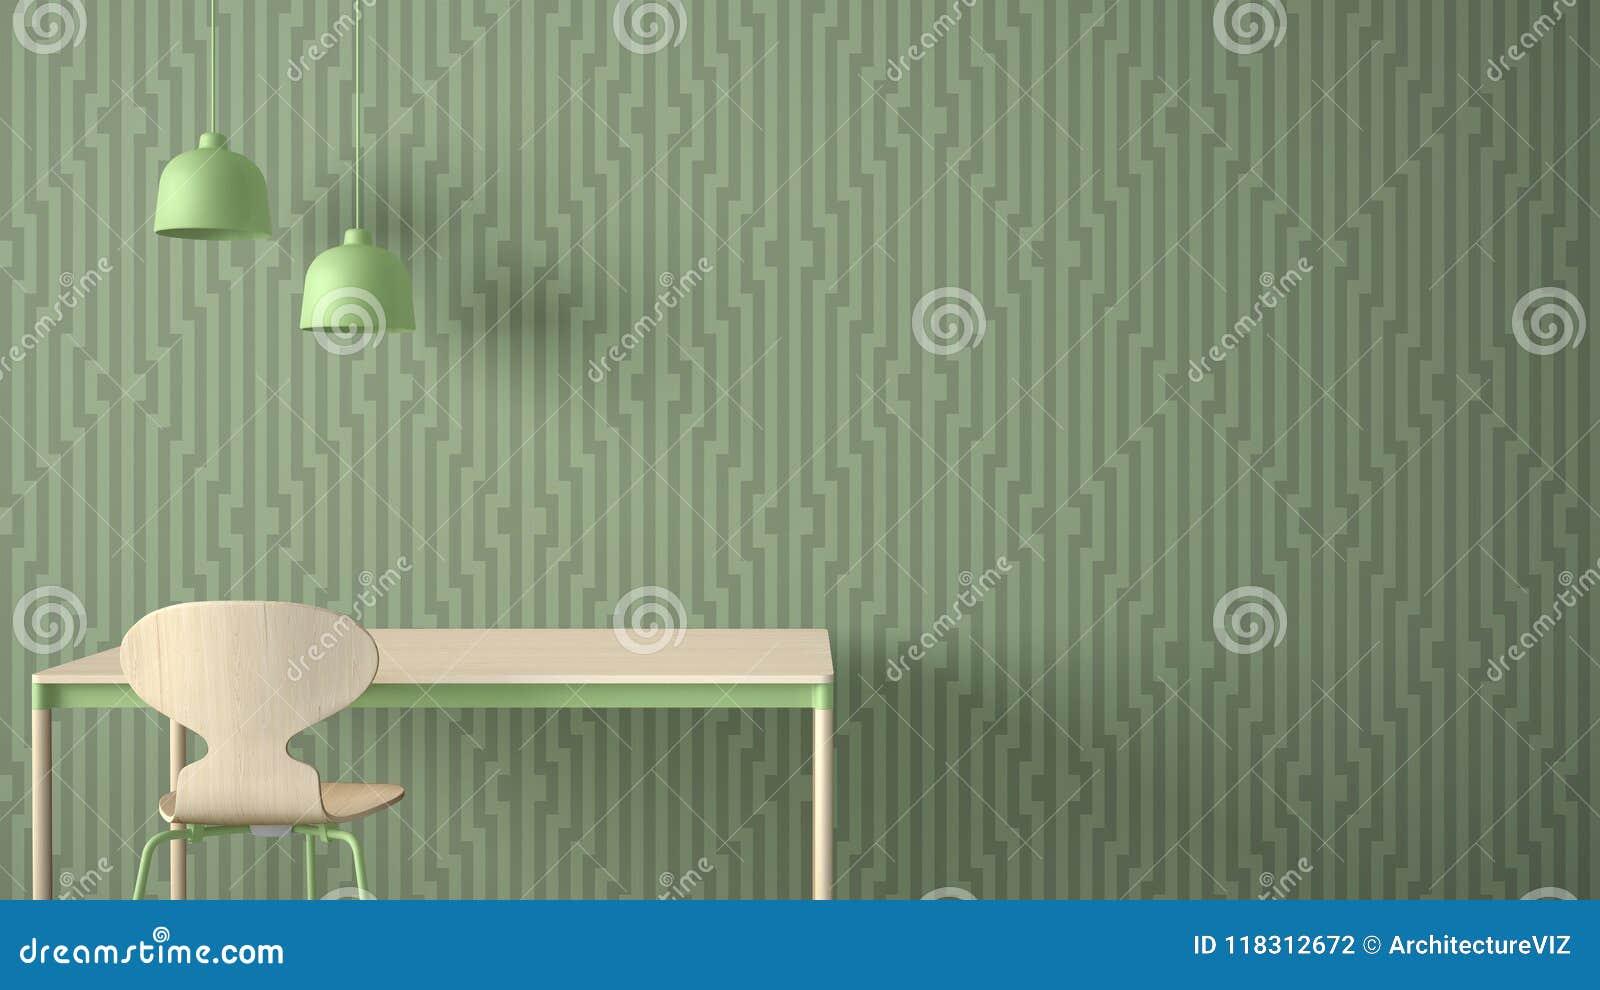 Minimalist Architect Designer Concept Table Desk And Chair Kitchen